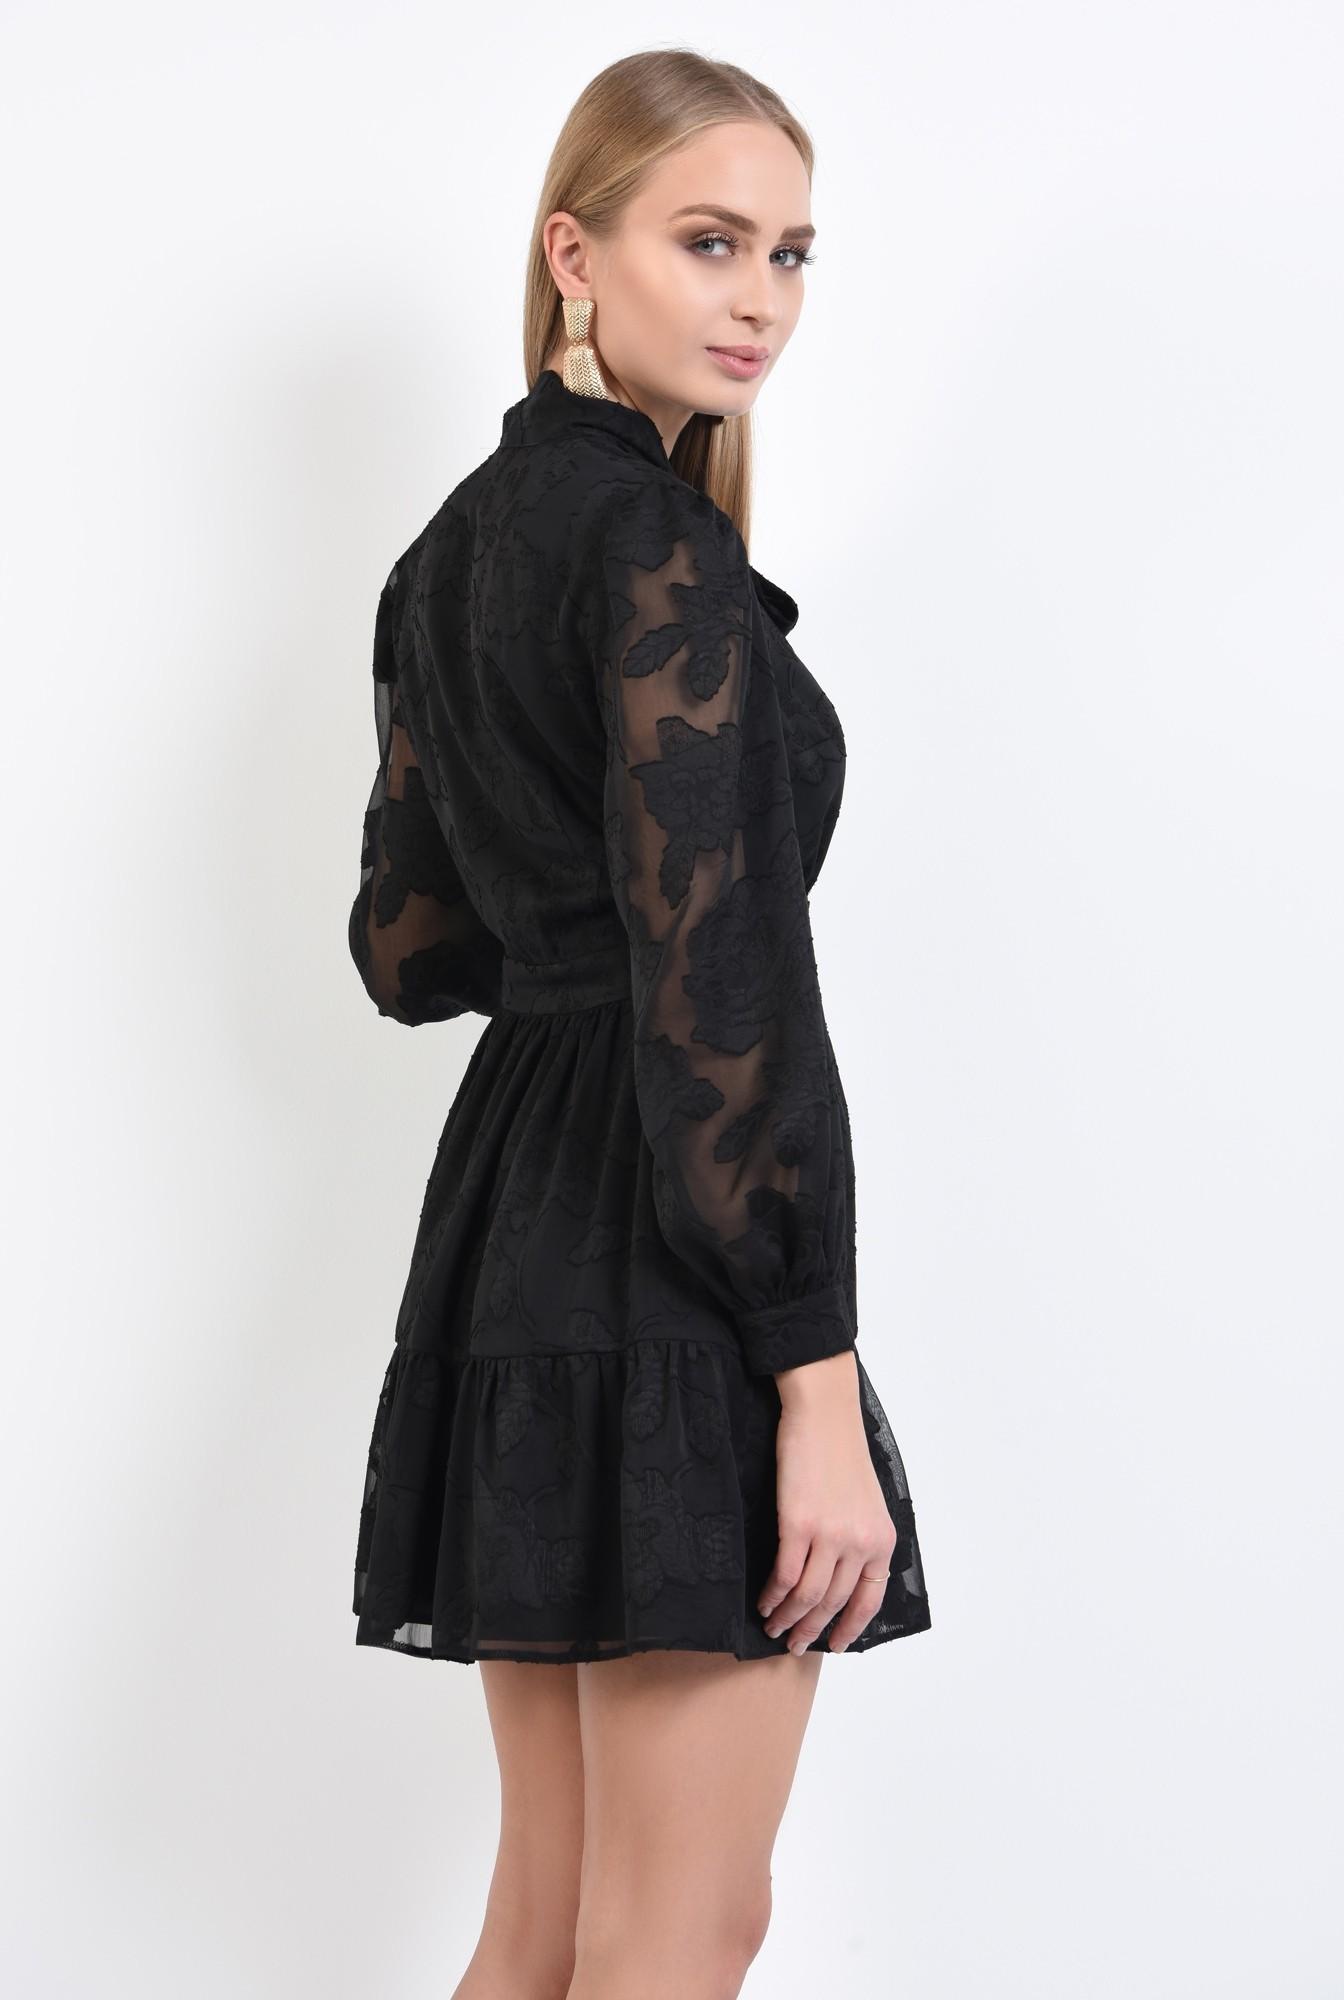 1 - rochie neagra, little black dress, croi evazat cu volan